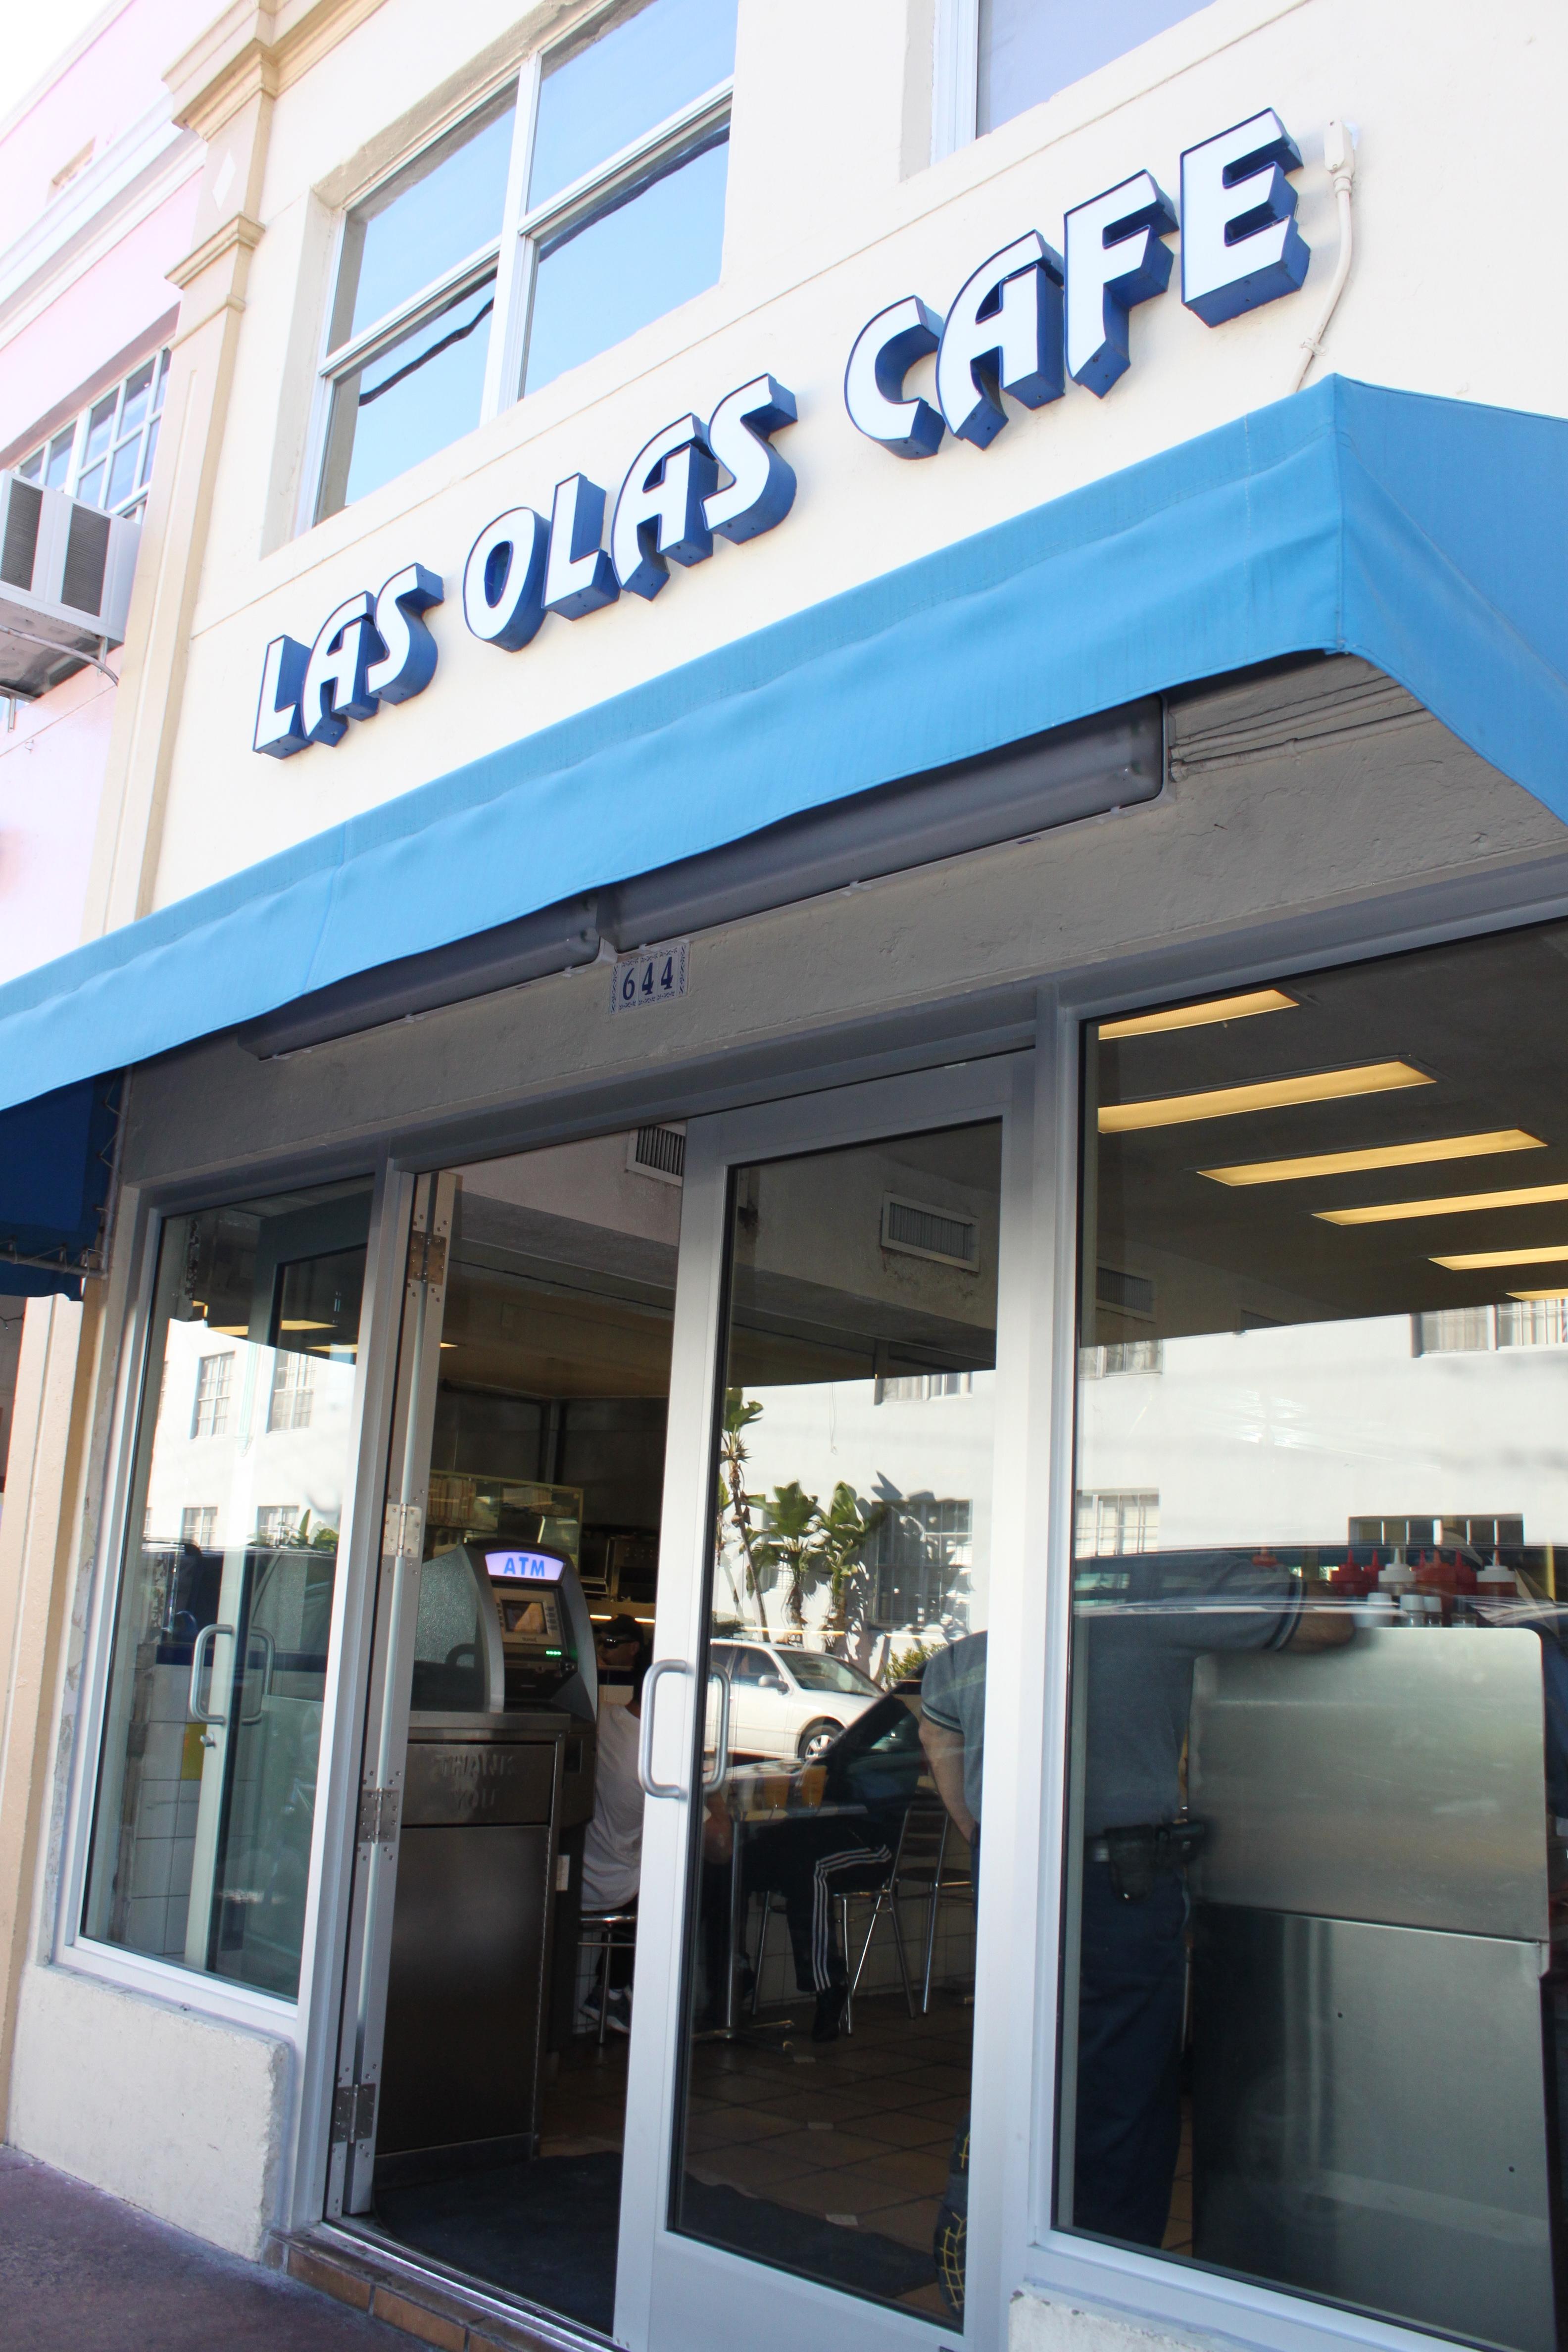 Las Olas Cafe South Beach